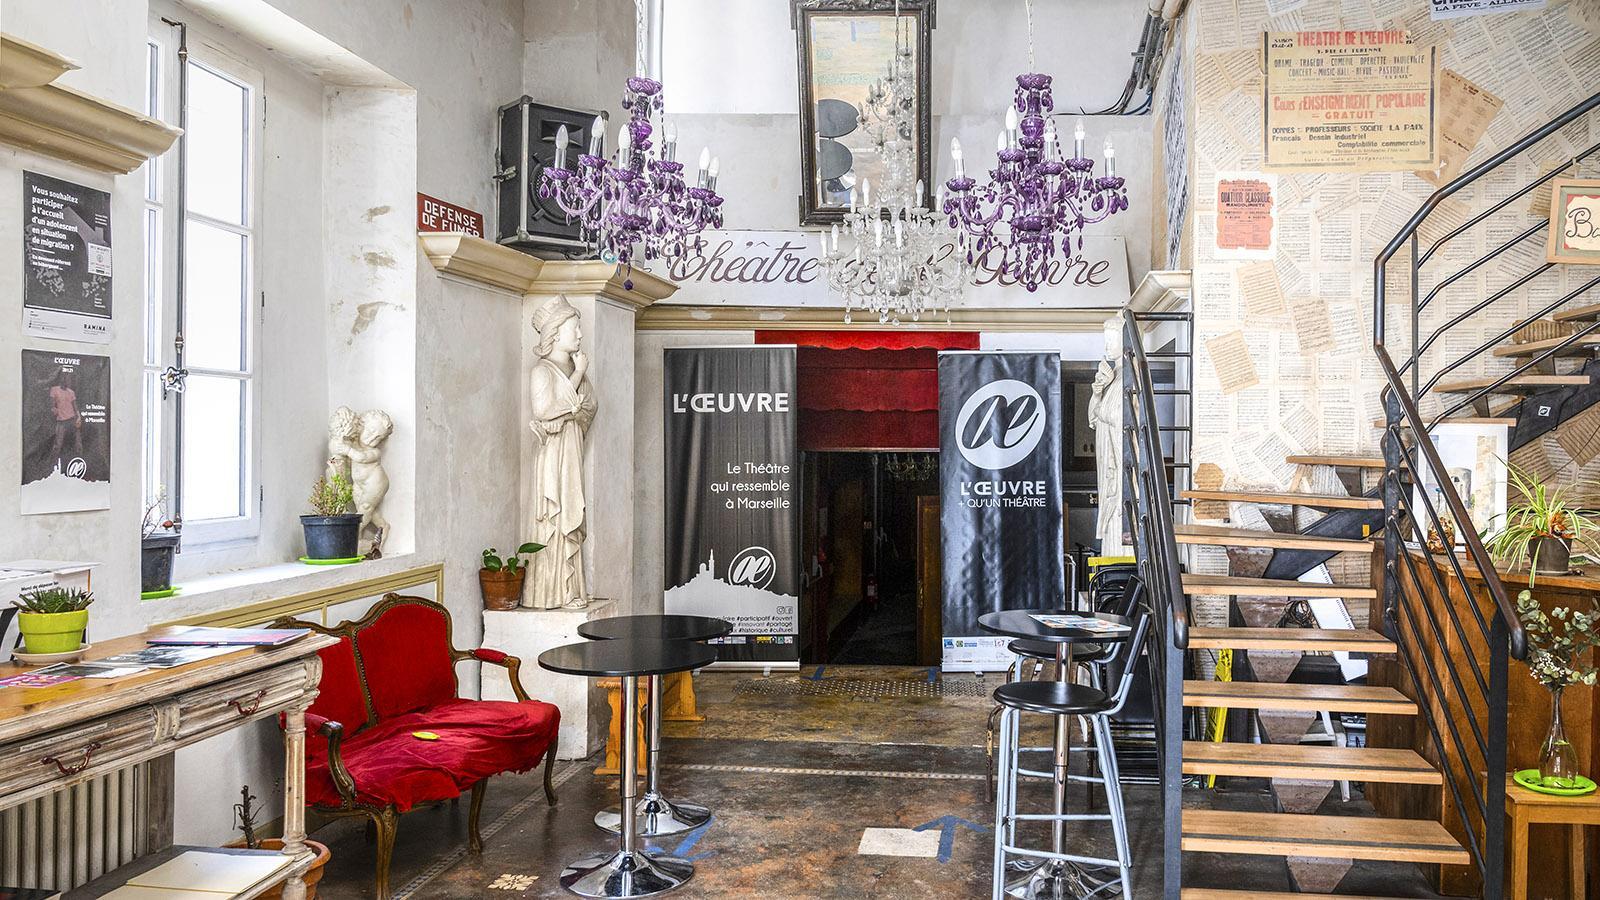 Die Lobby vom Théâtre de L'Œuvre. Foto: Hilke Maunder